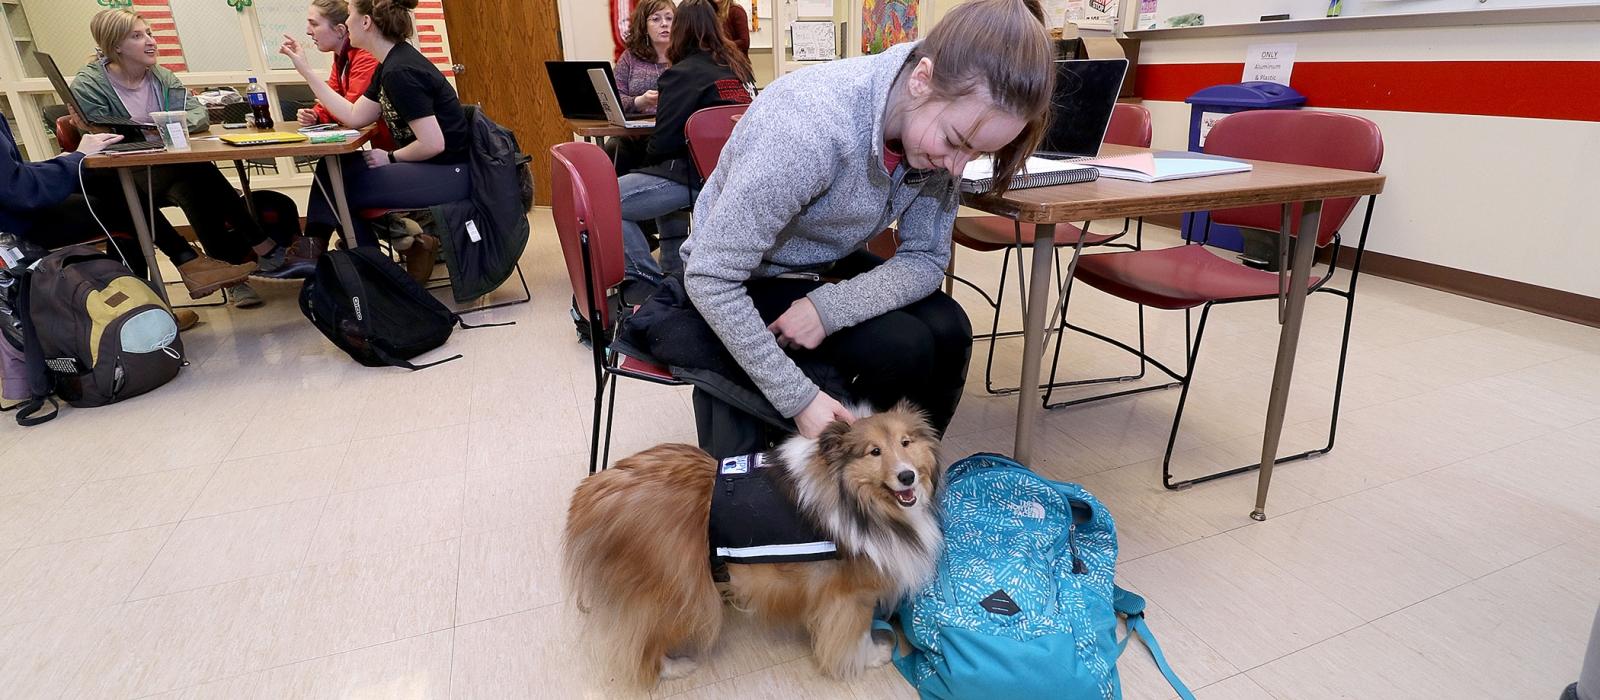 A student pets a dog.